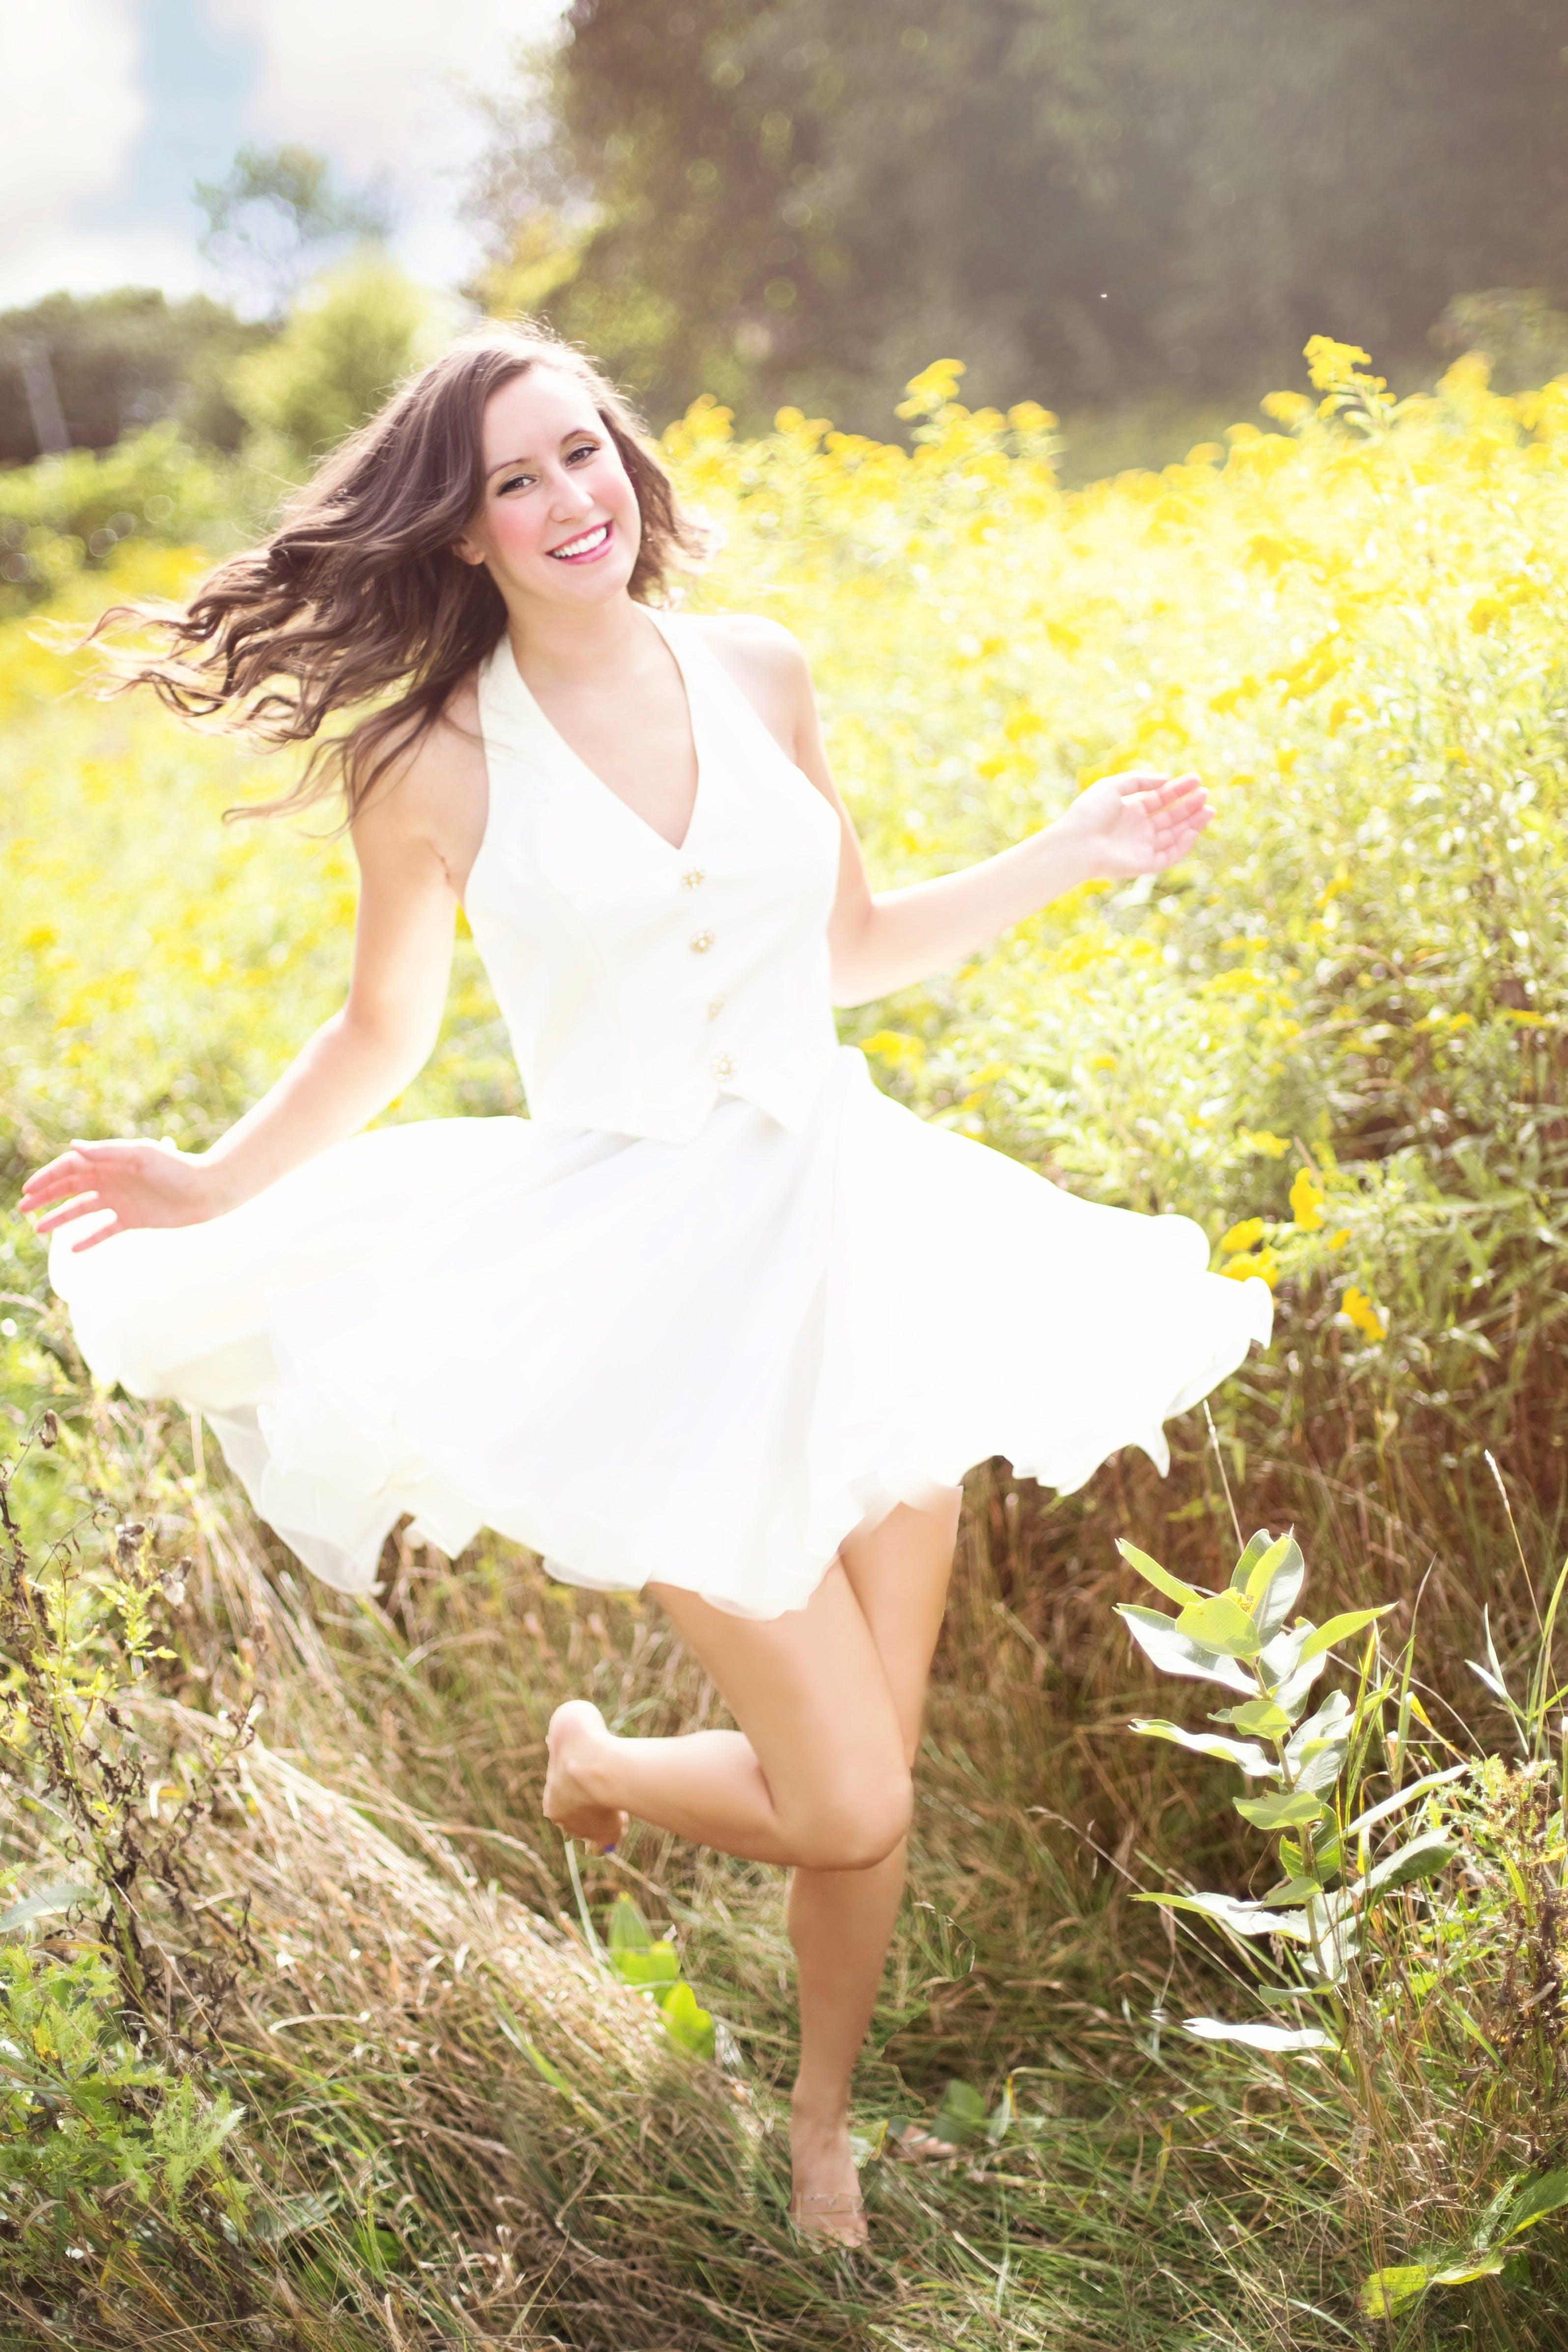 barefoot, brunette, carefree